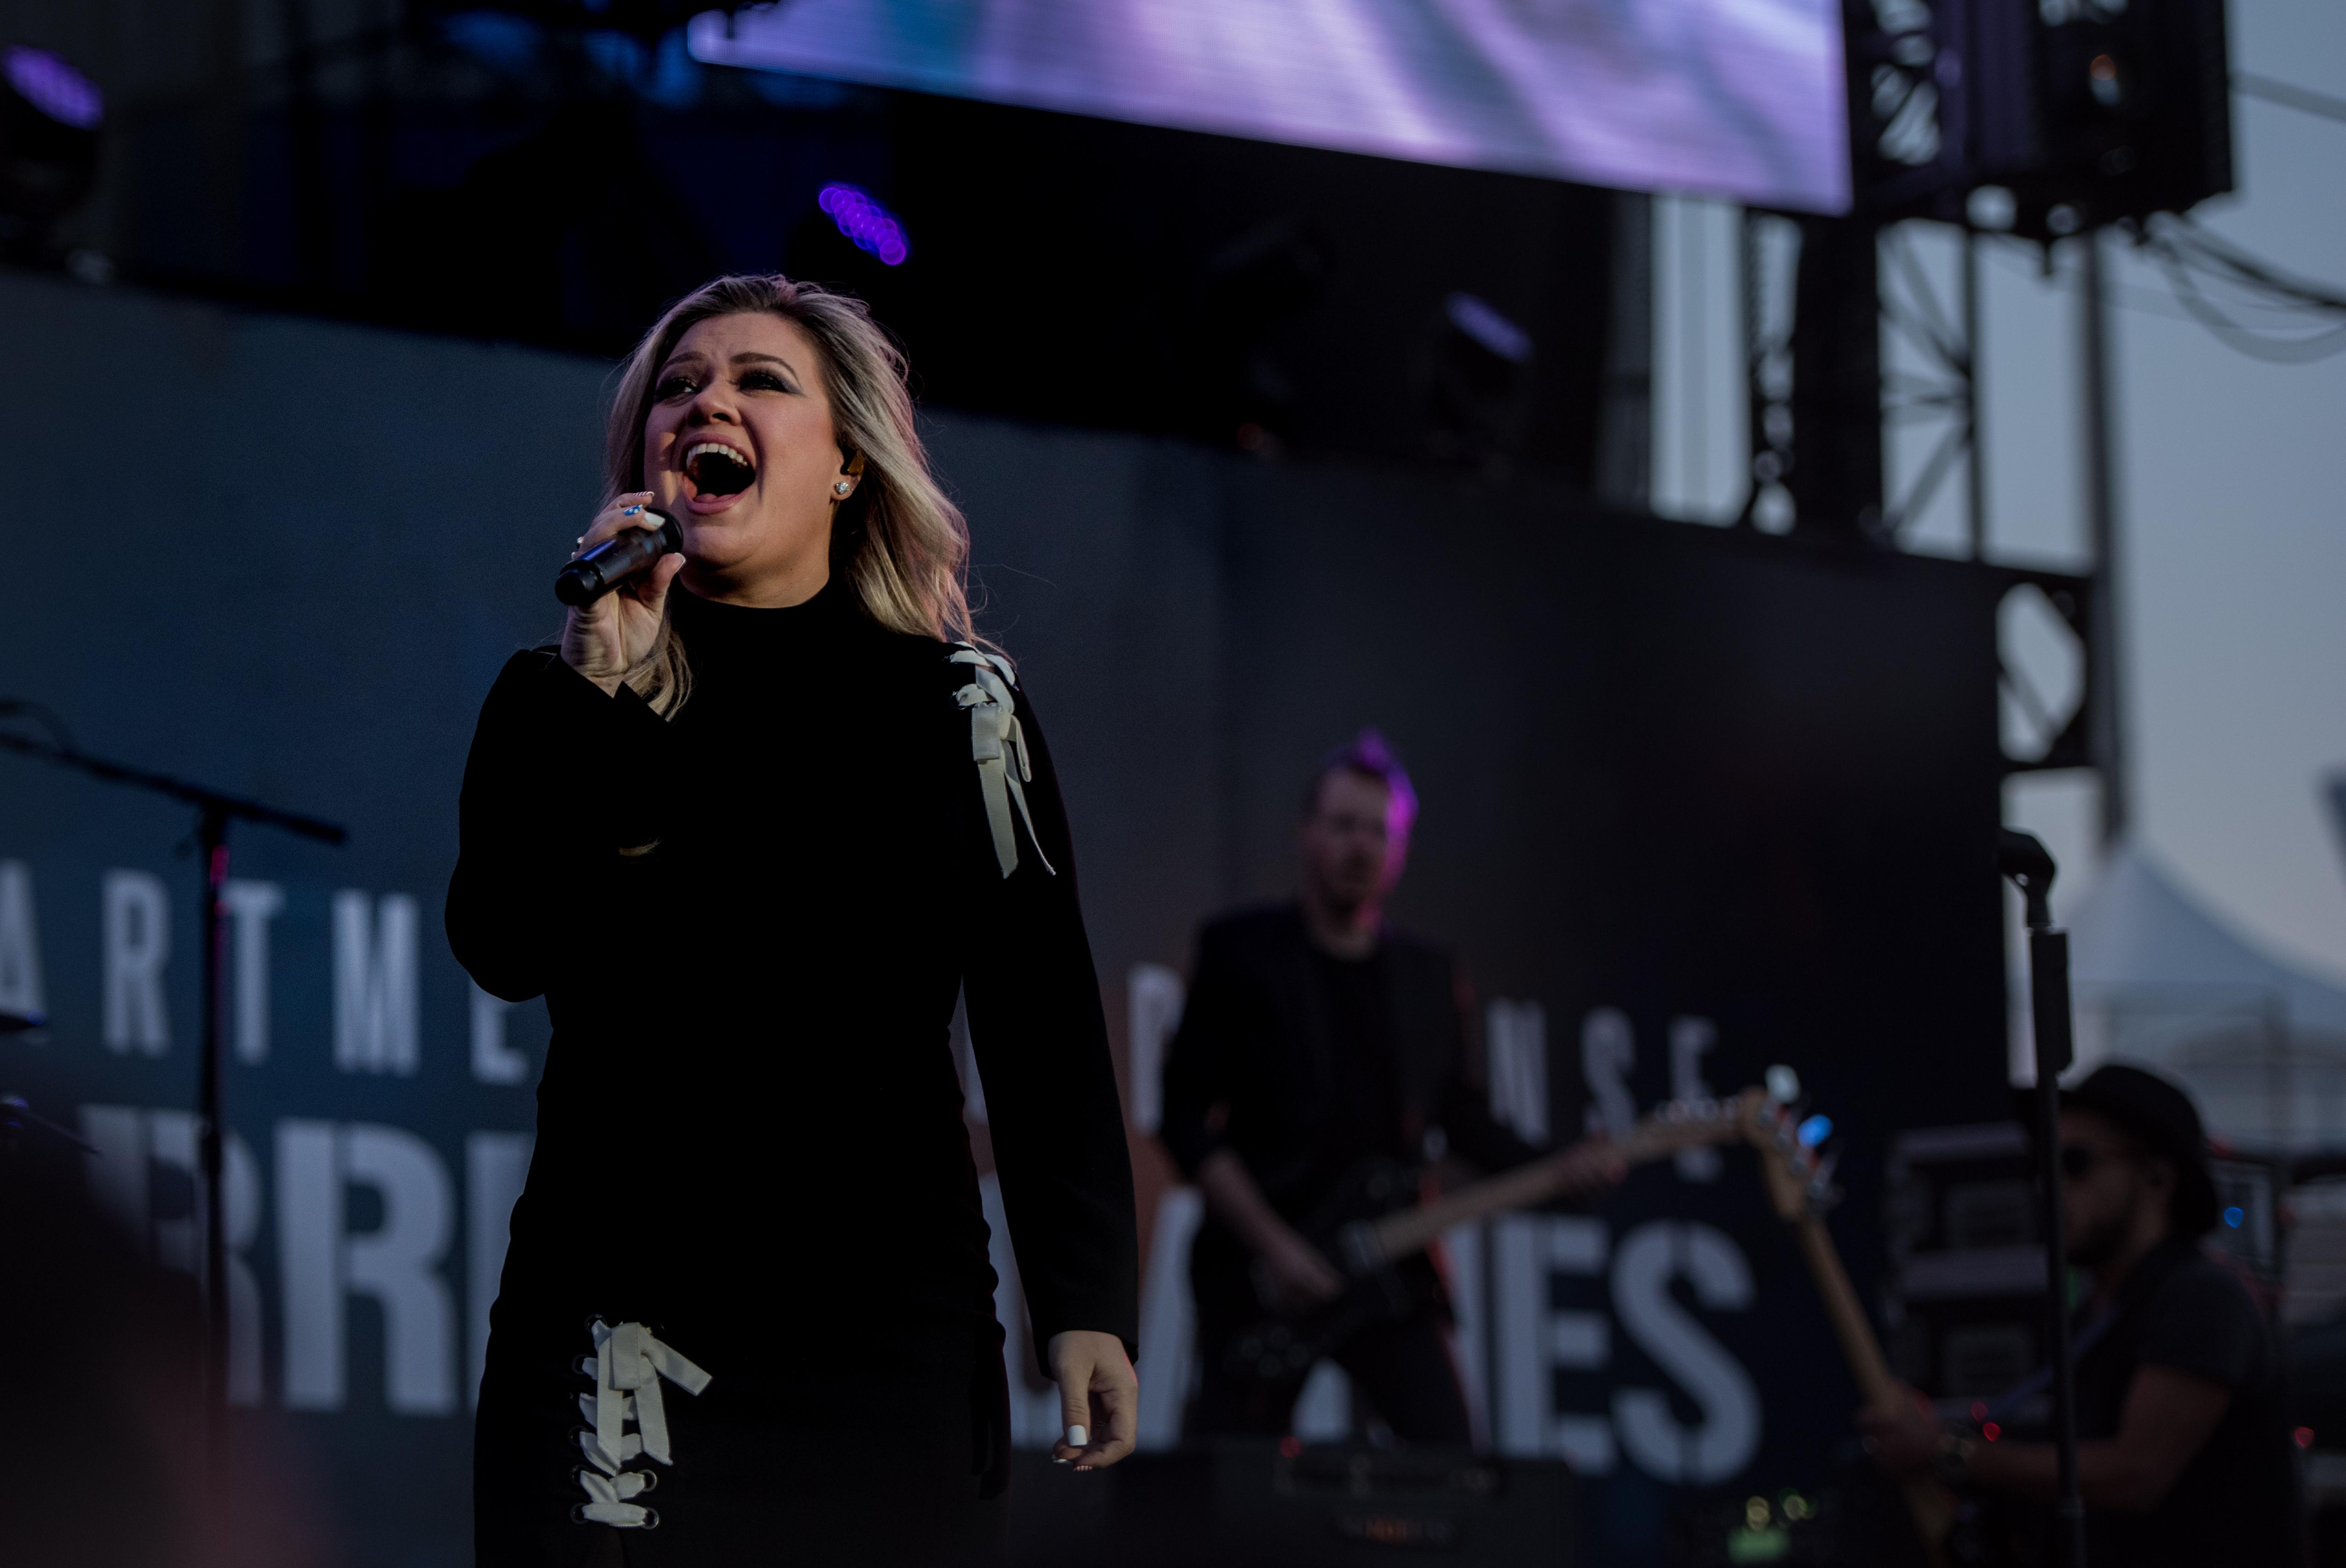 File:Kelly Clarkson 2018 DoD Warrior Games Opening Ceremony 2.jpg ...